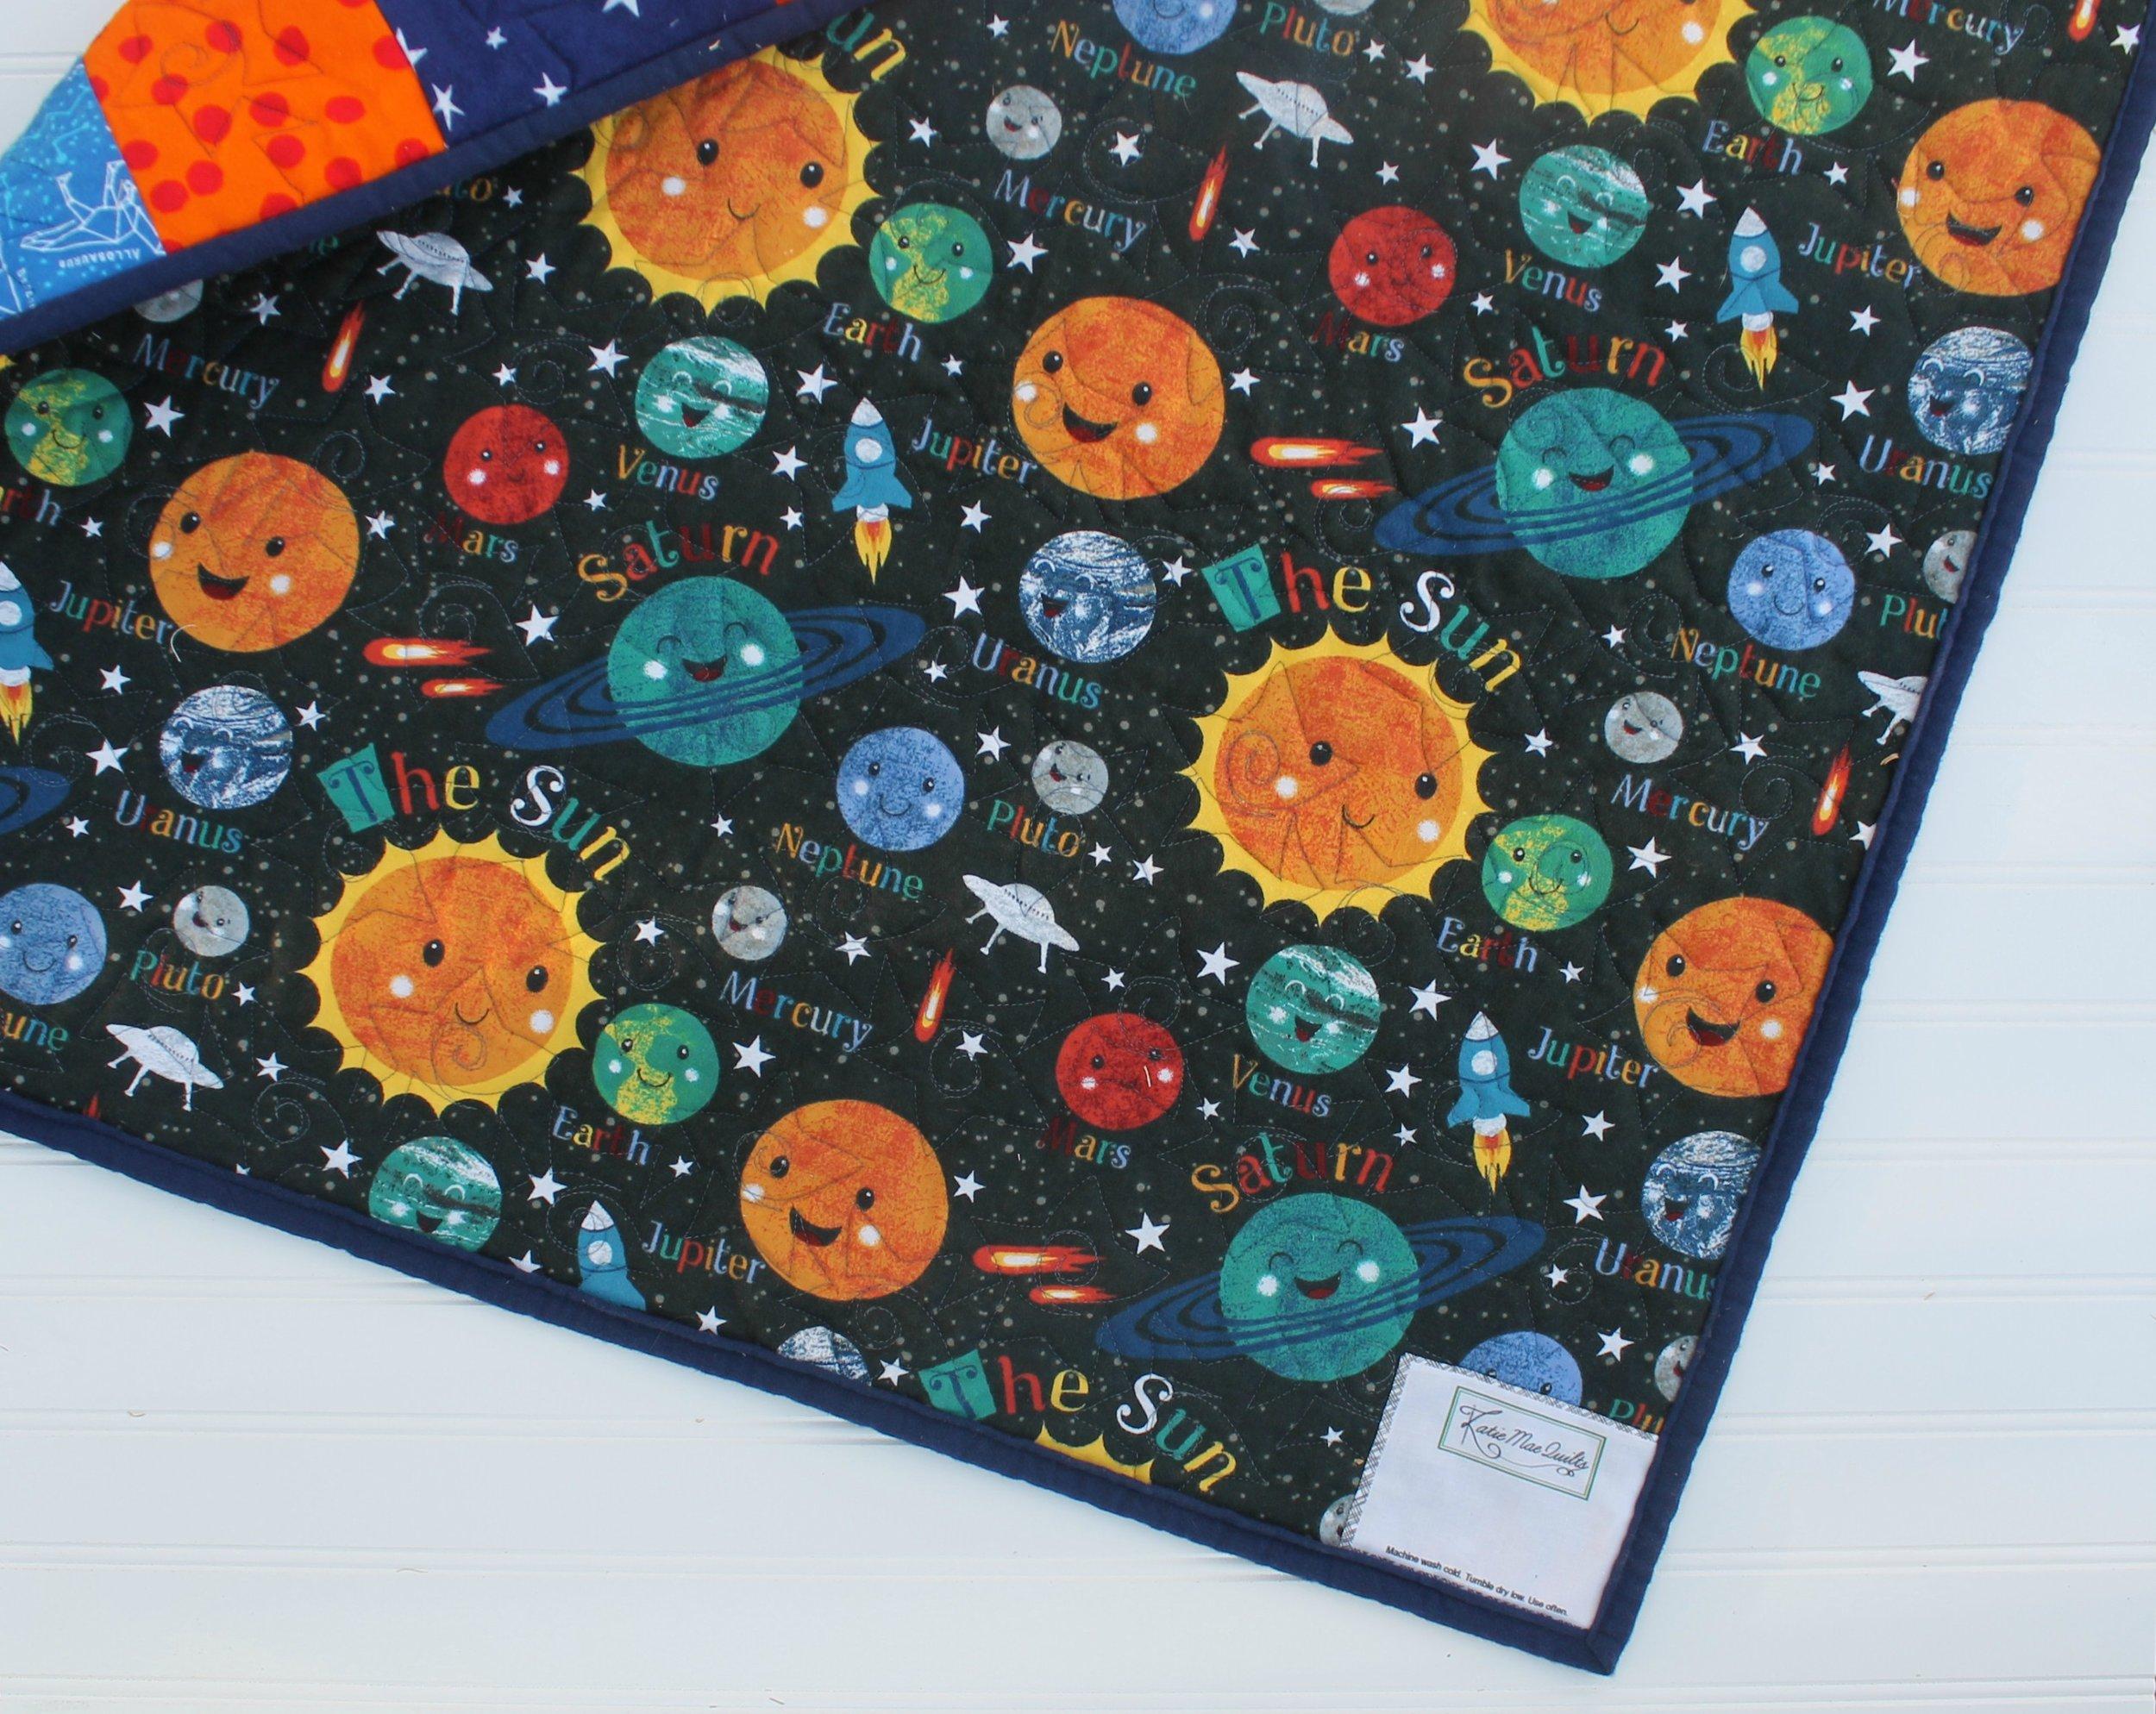 space_flannel_quilt3.jpg